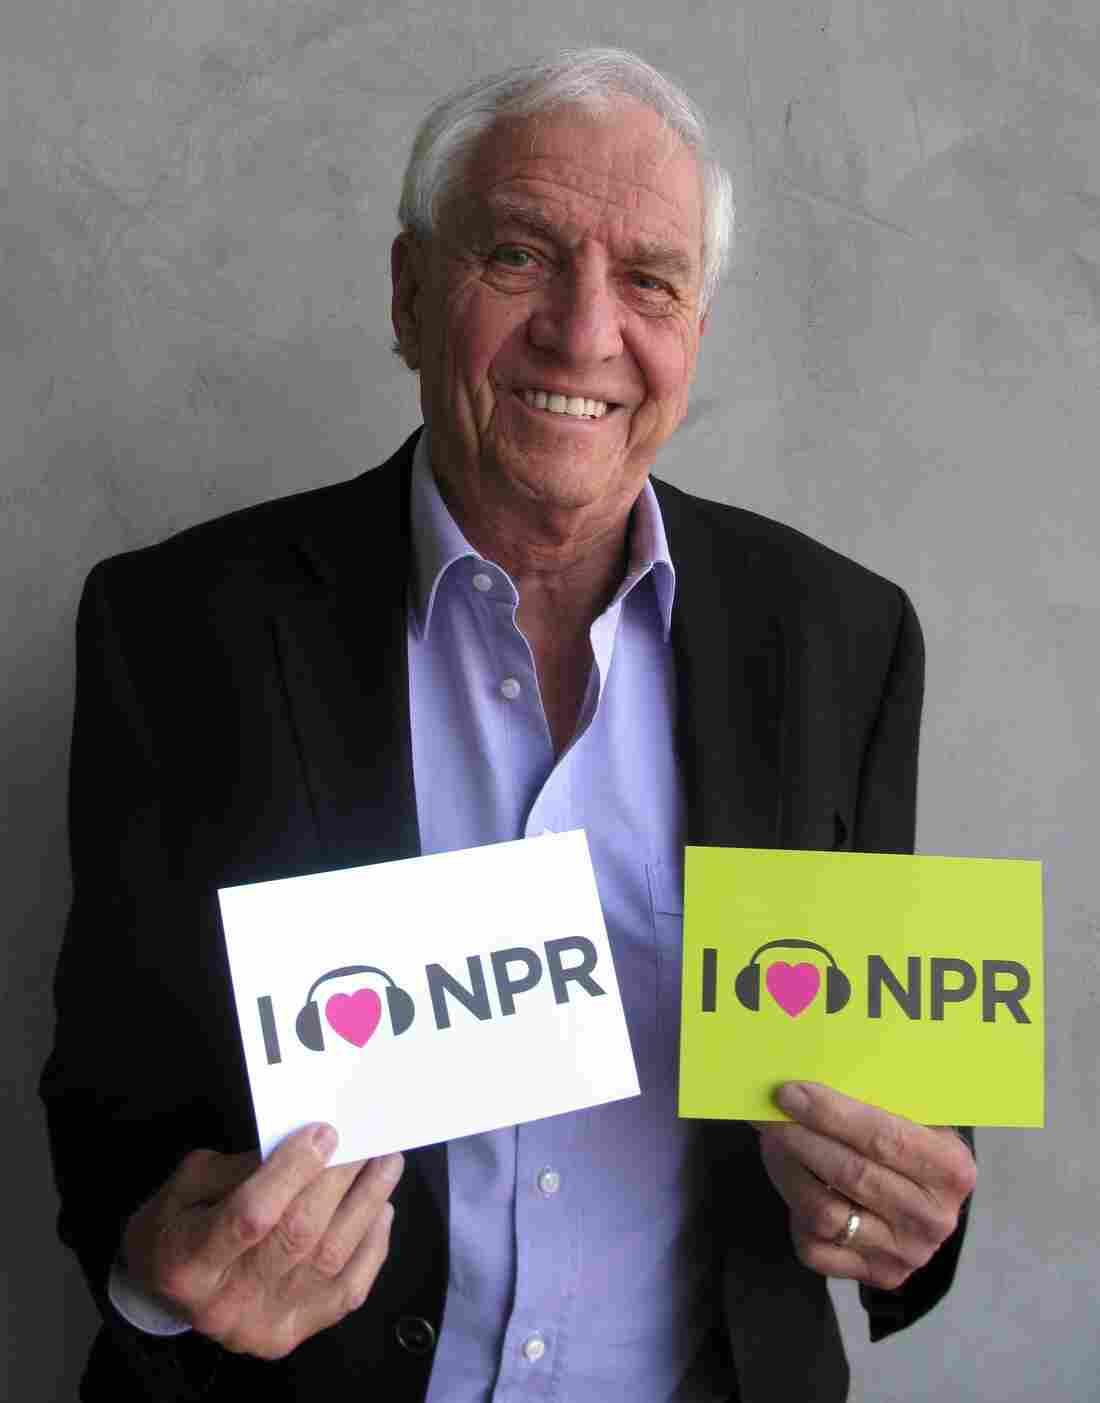 Garry Marshall at NPR West